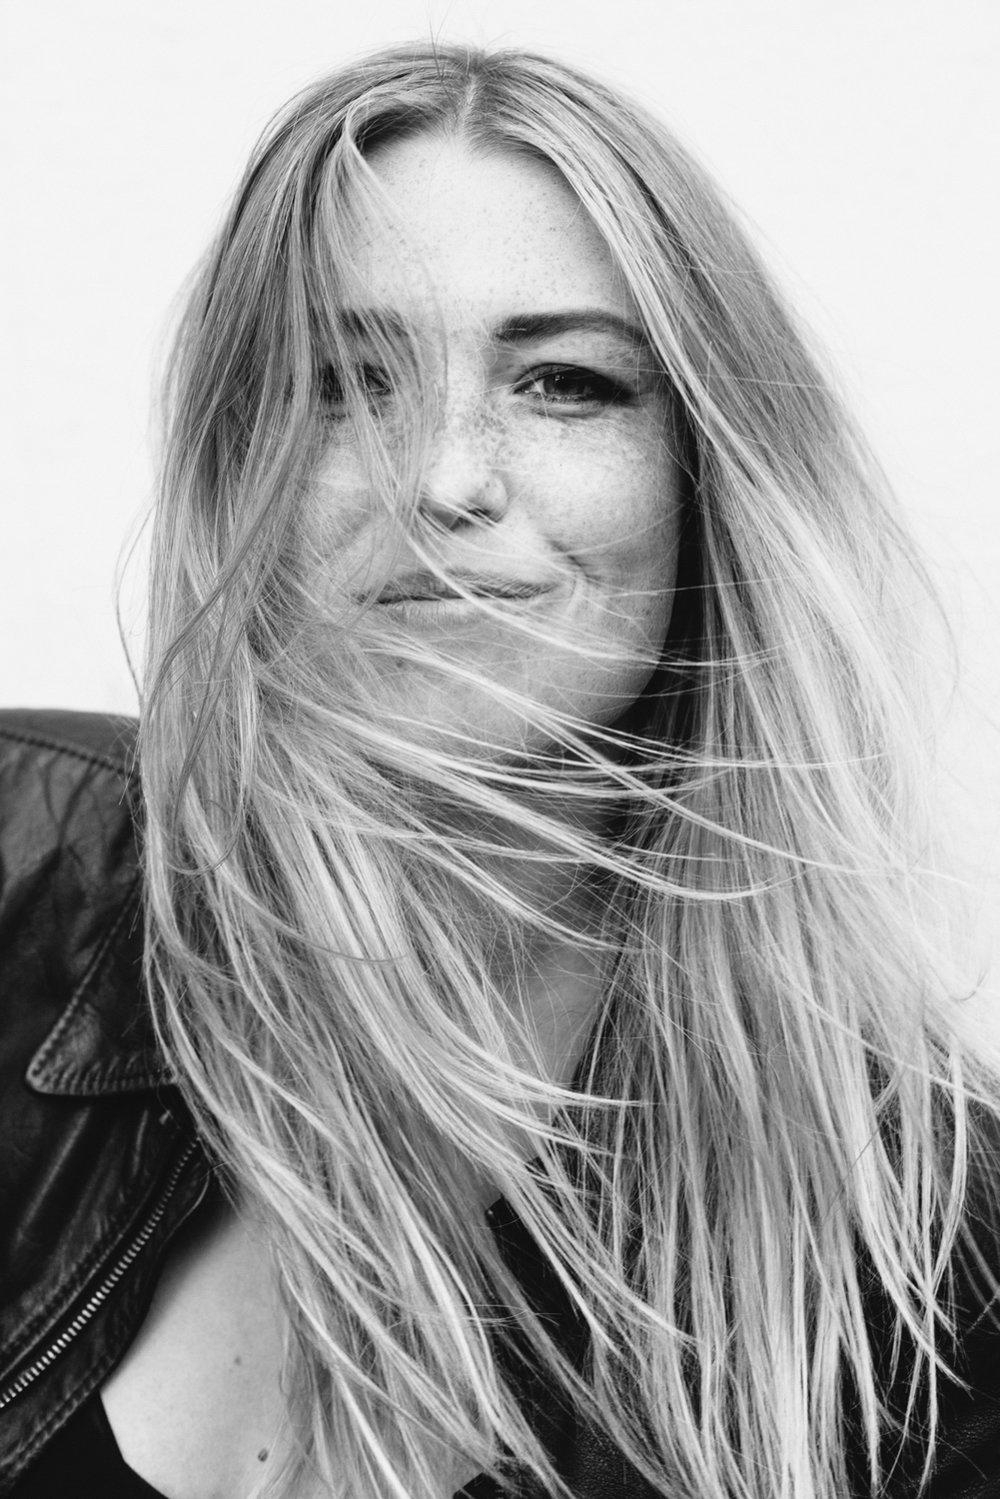 Portrait by Victorya Lunde.